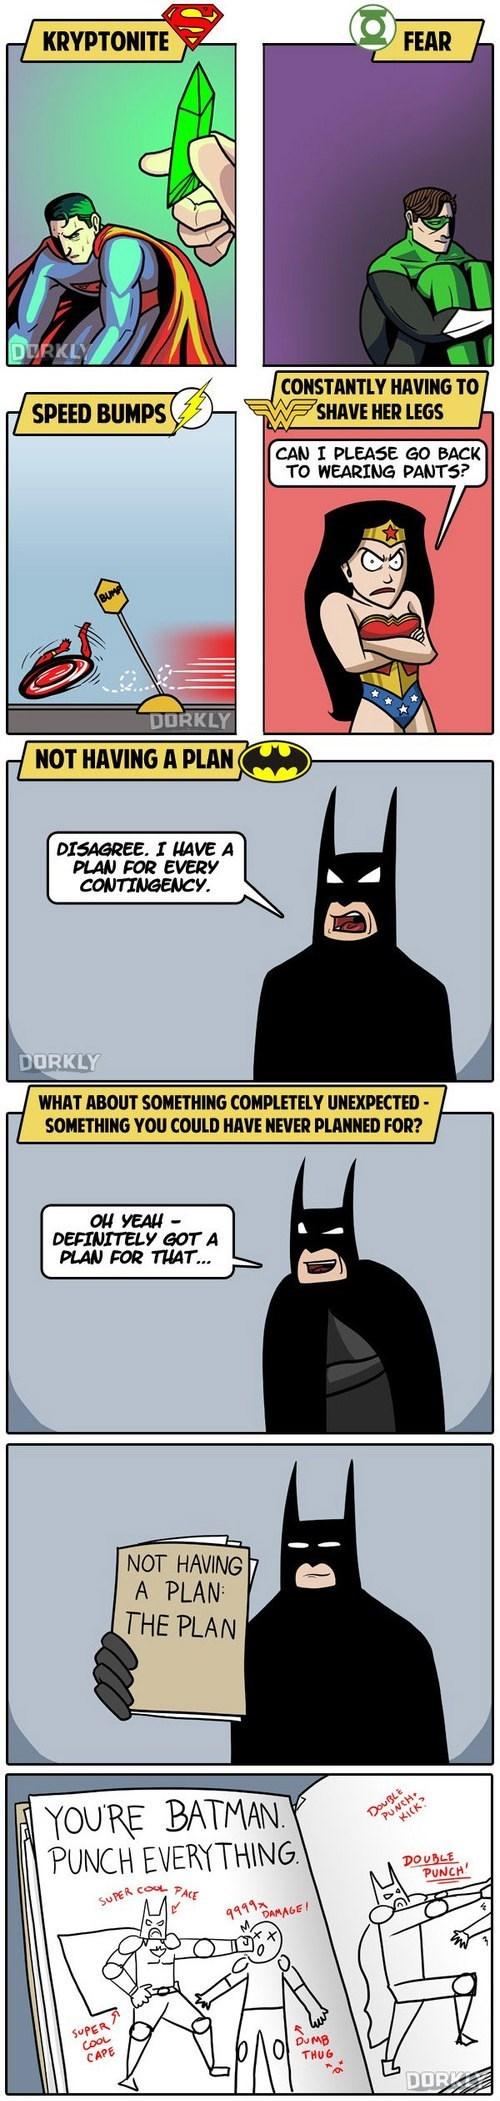 batman dorkly justice league weakness